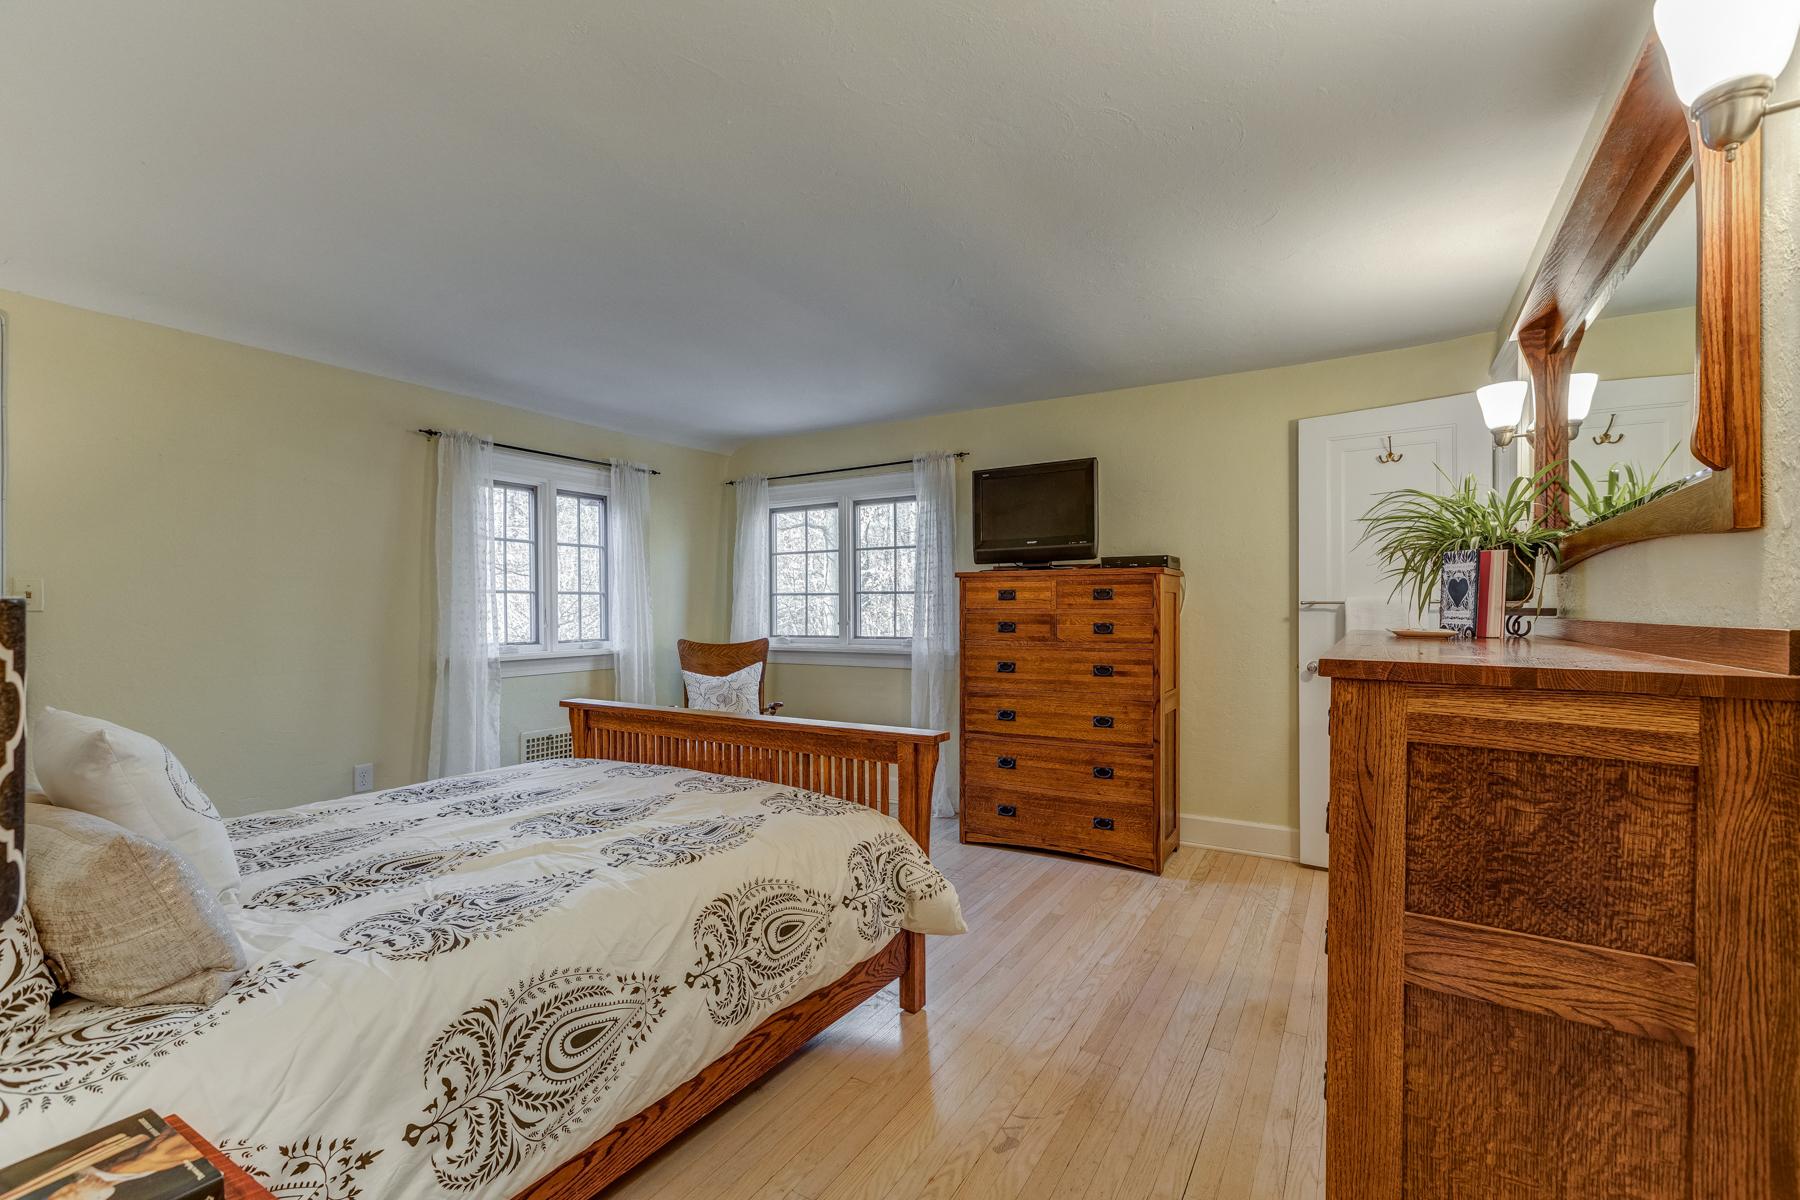 10. Master Bedroom ll_53A1818_19_20